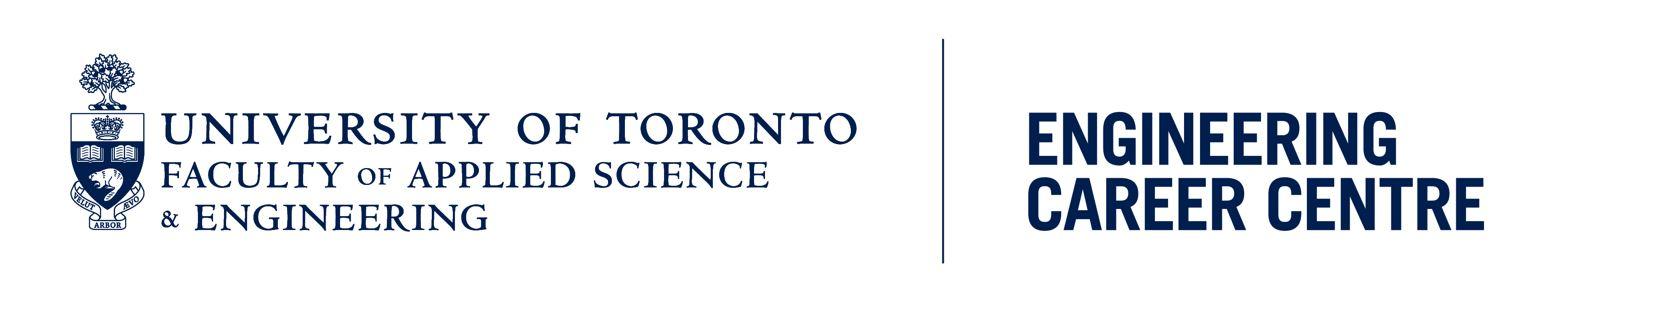 University of Toronto Engineering Career Centre Logo